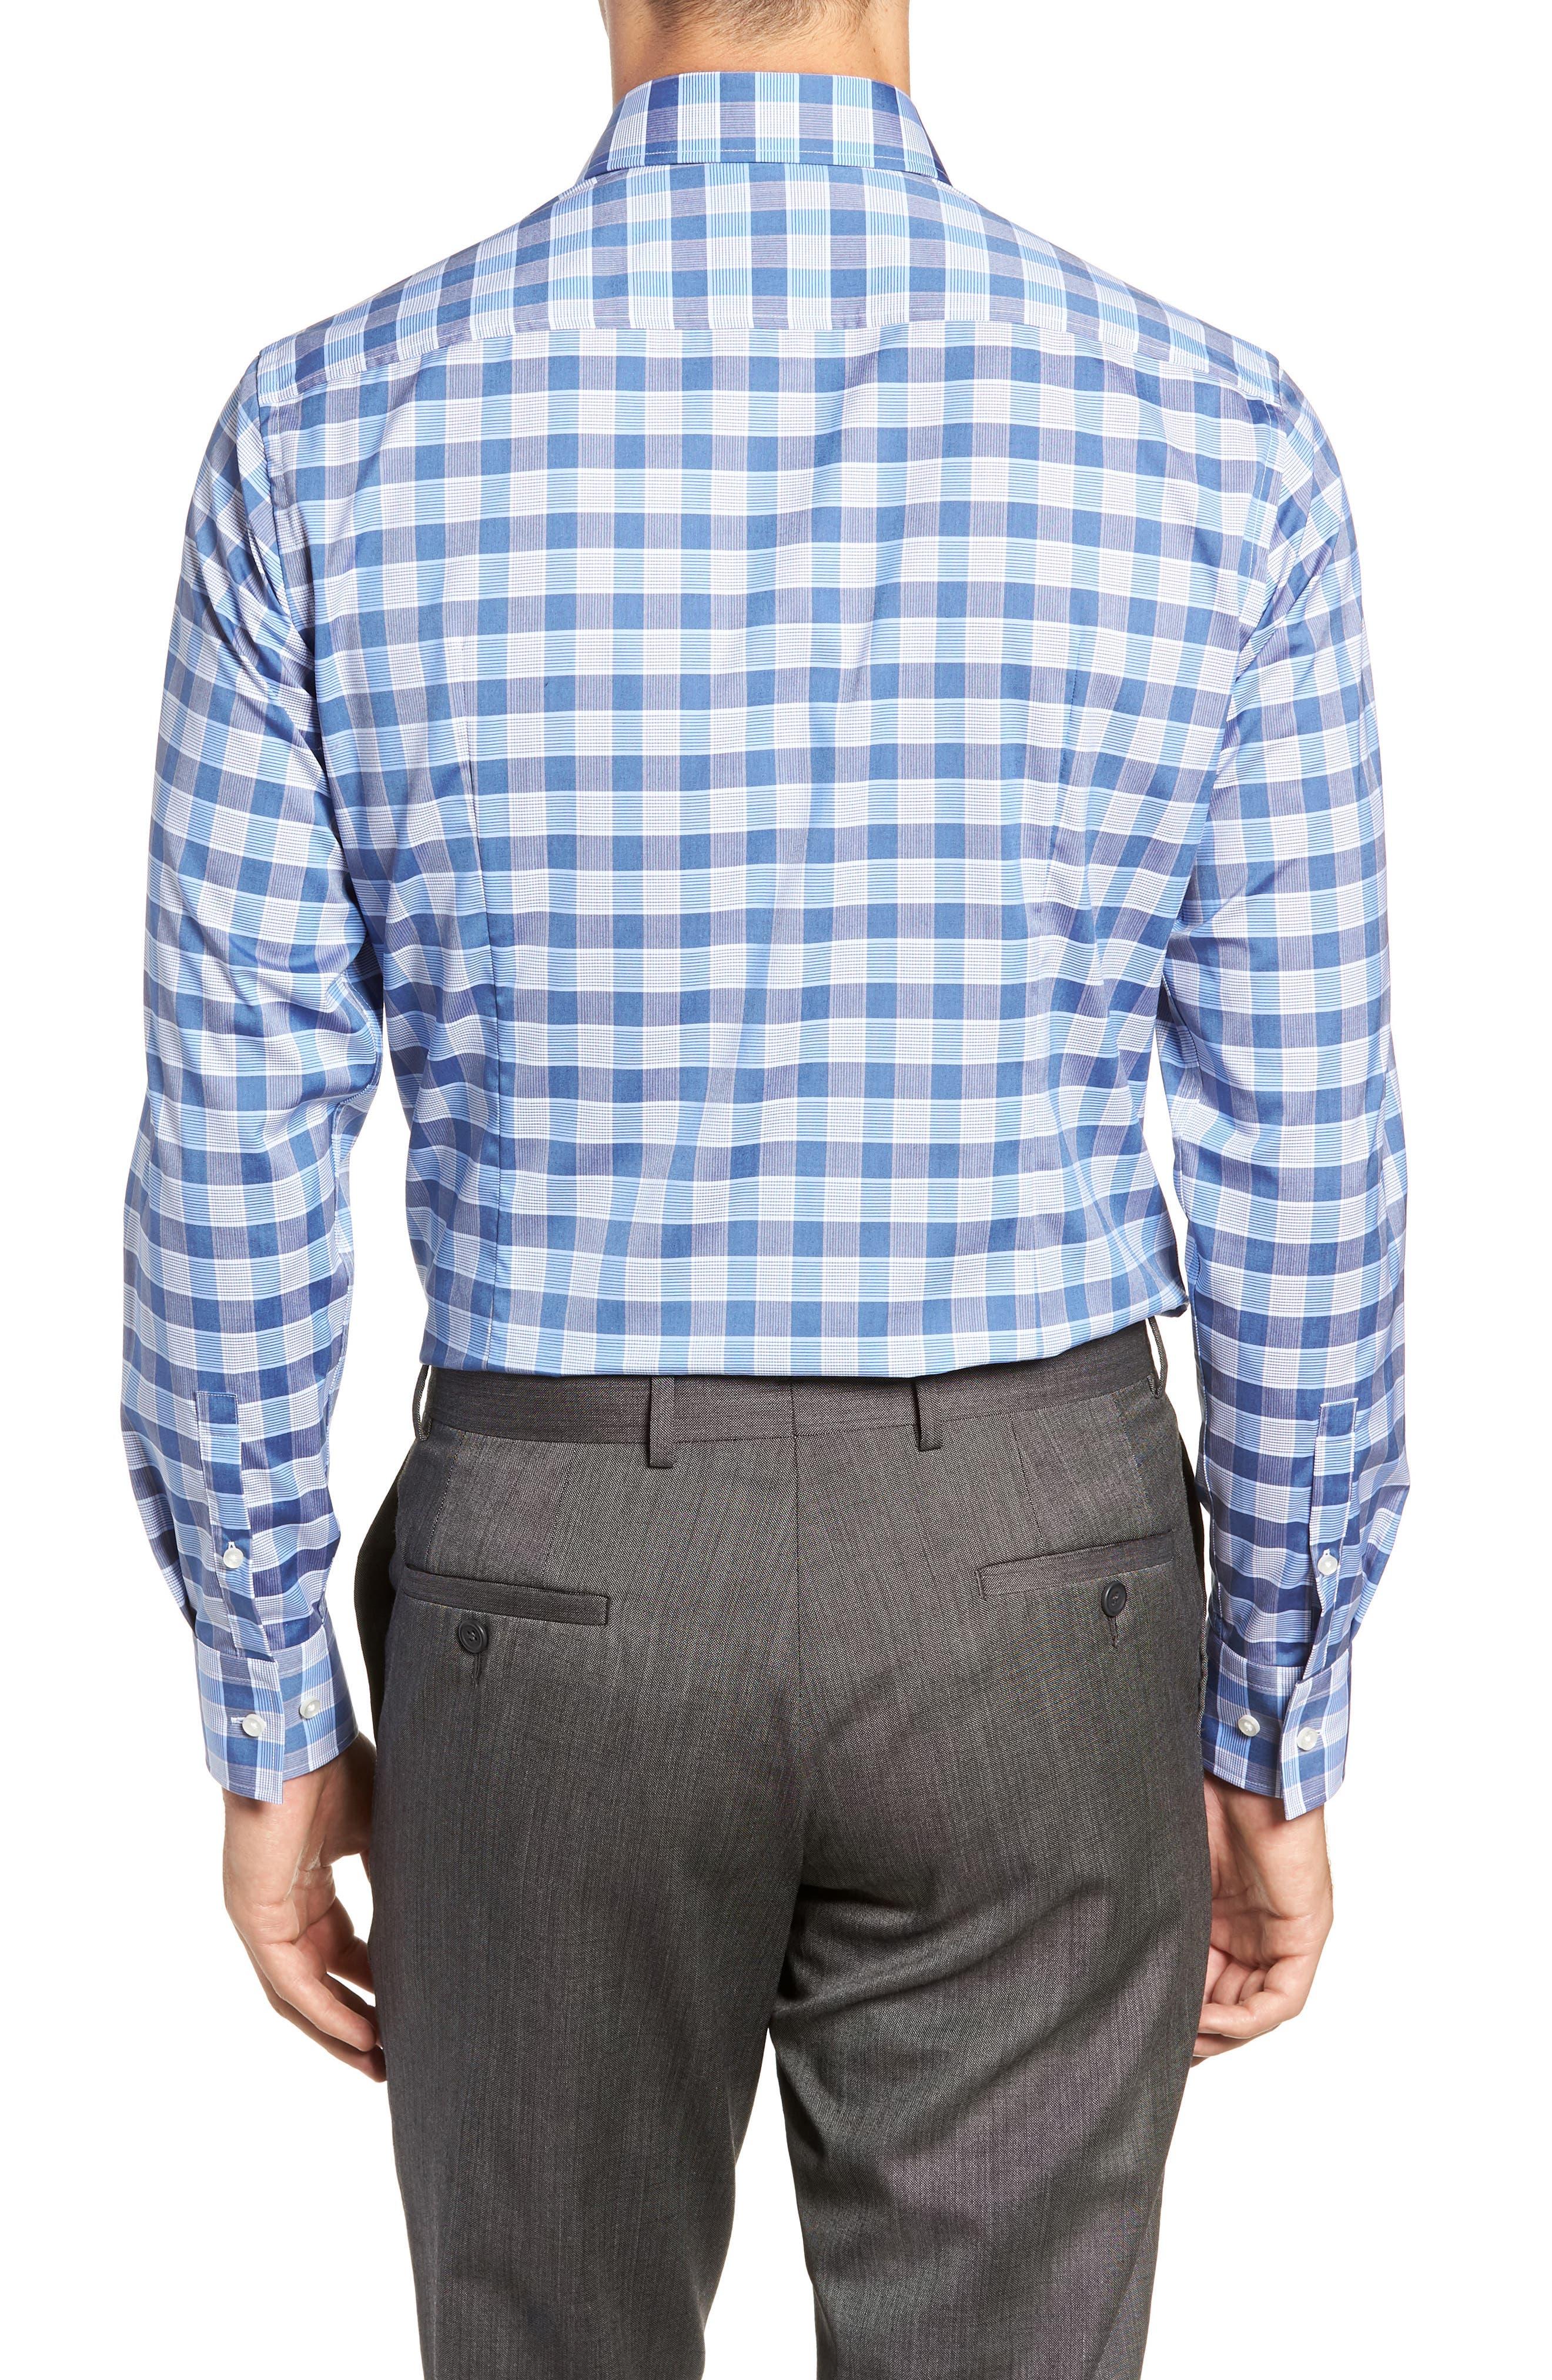 Jason Slim Fit Plaid Dress Shirt,                             Alternate thumbnail 3, color,                             BLUE